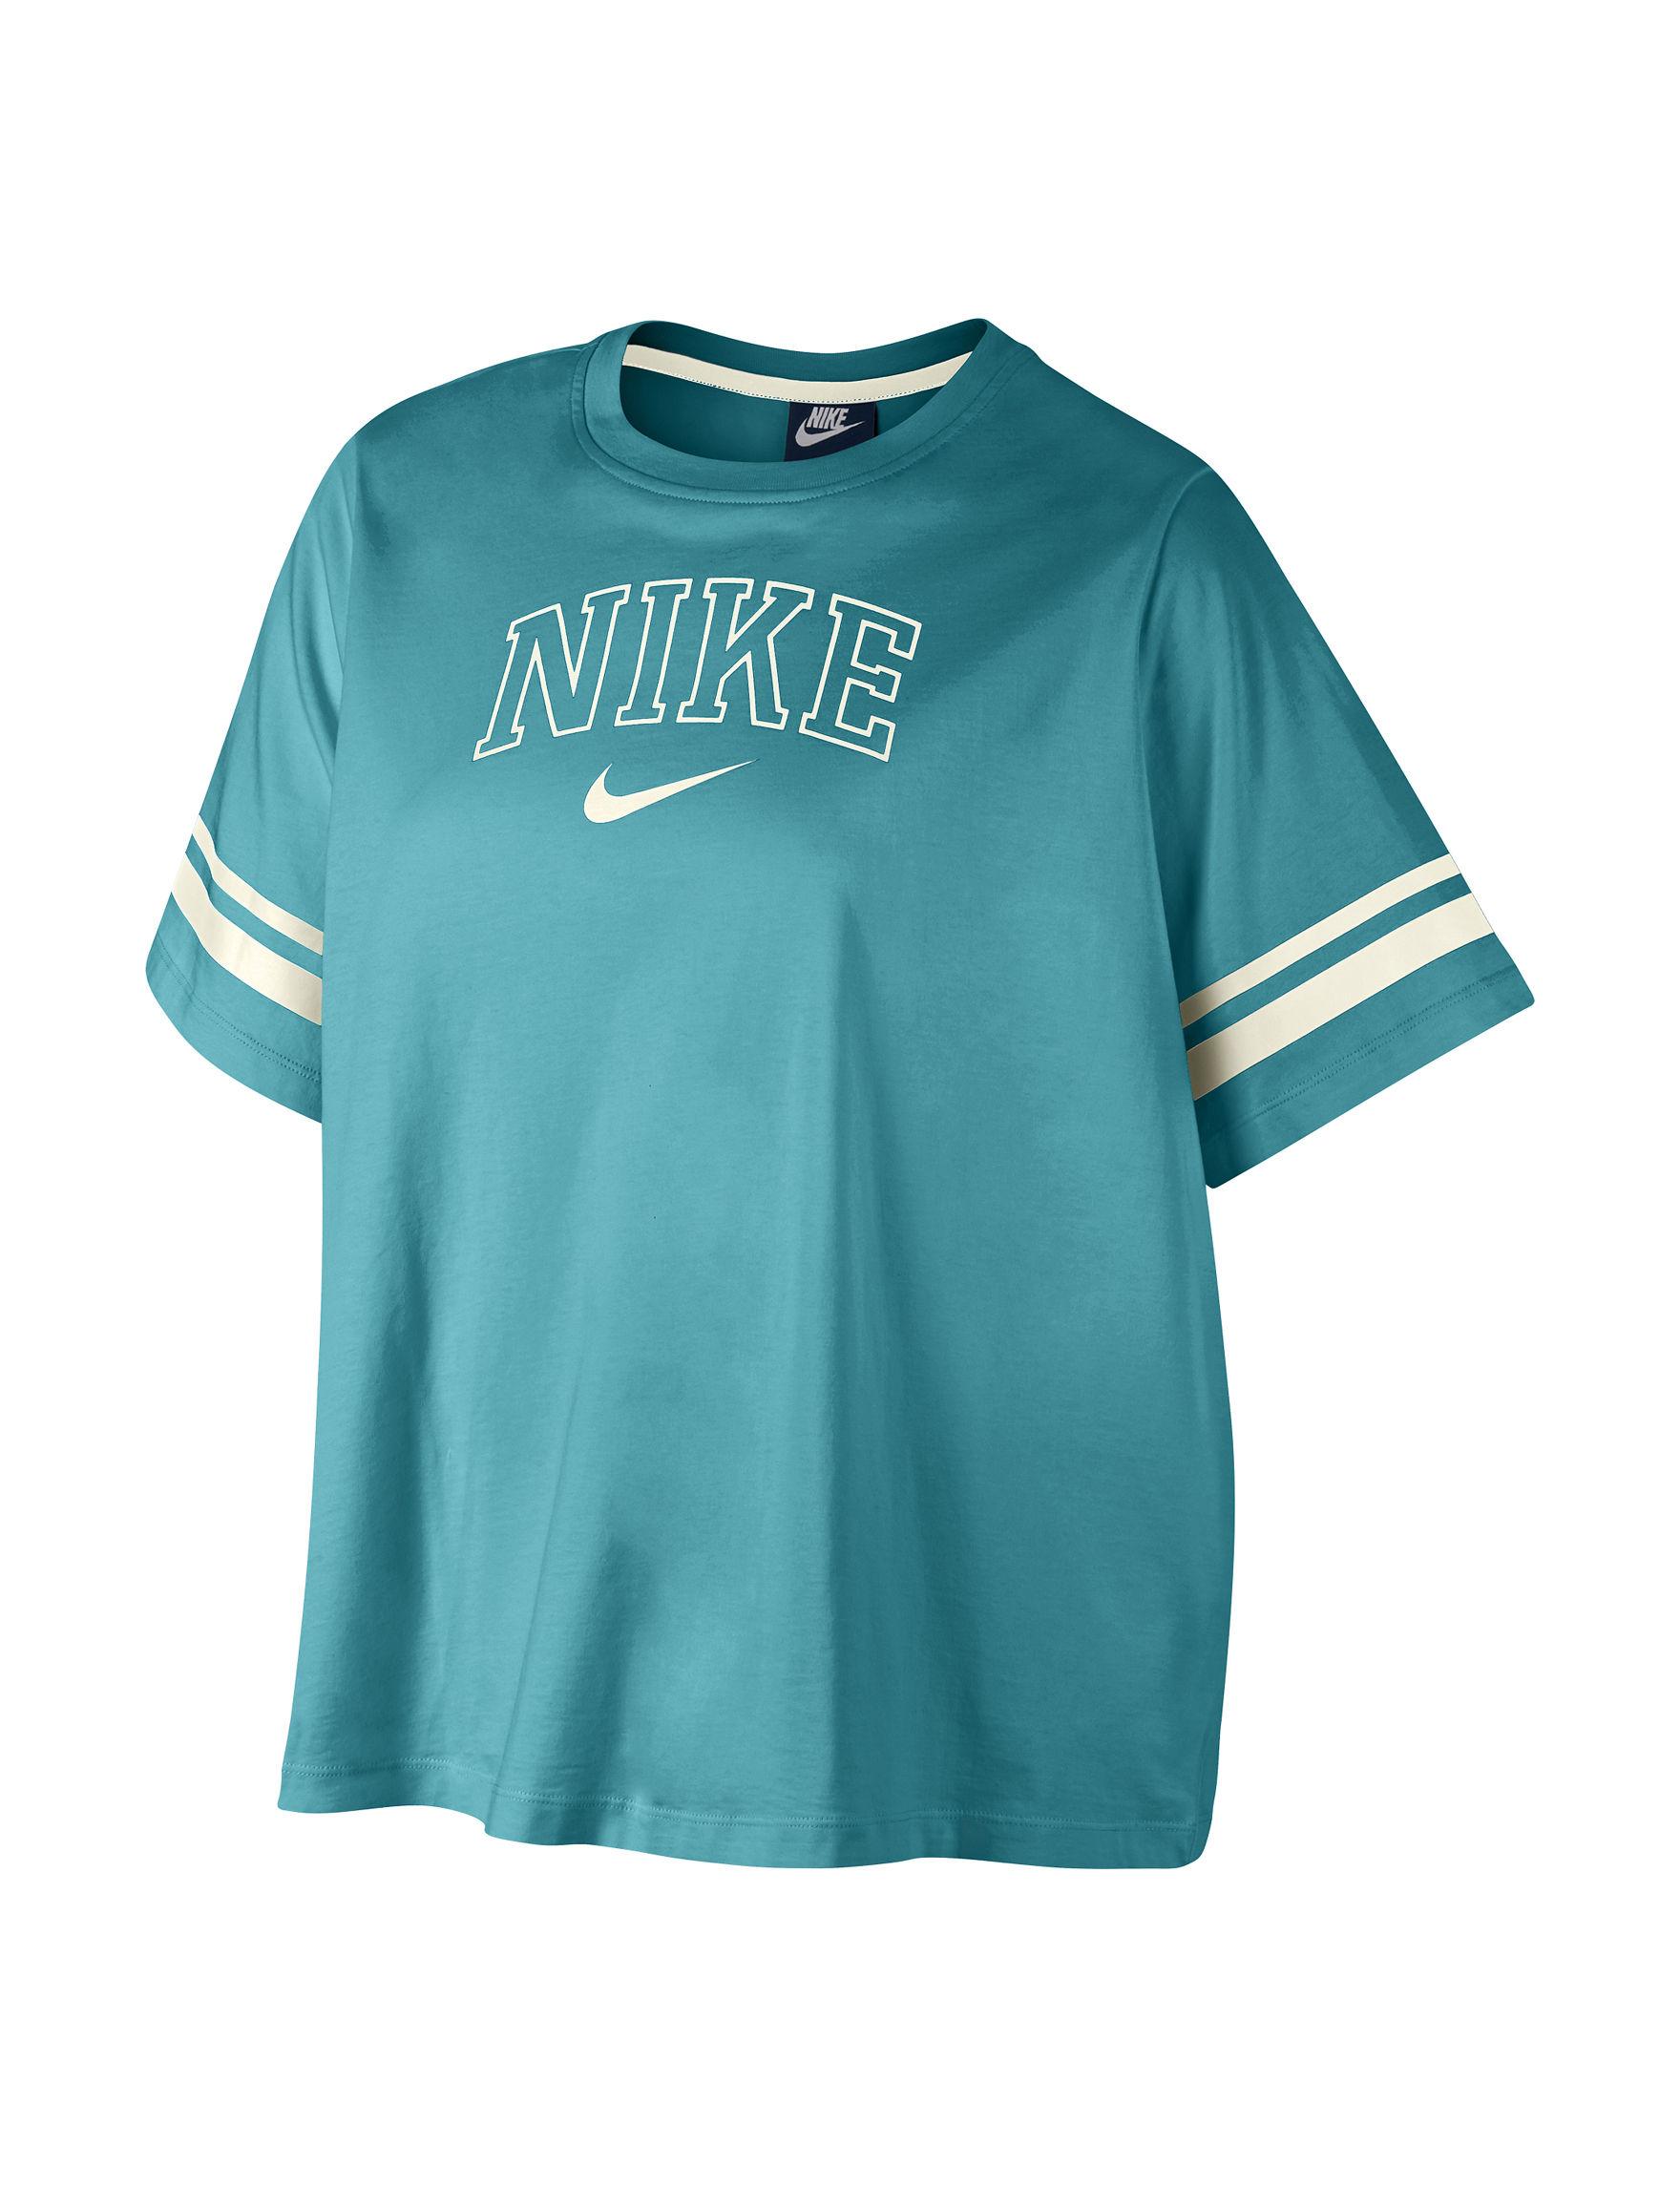 Nike Teal Tees & Tanks